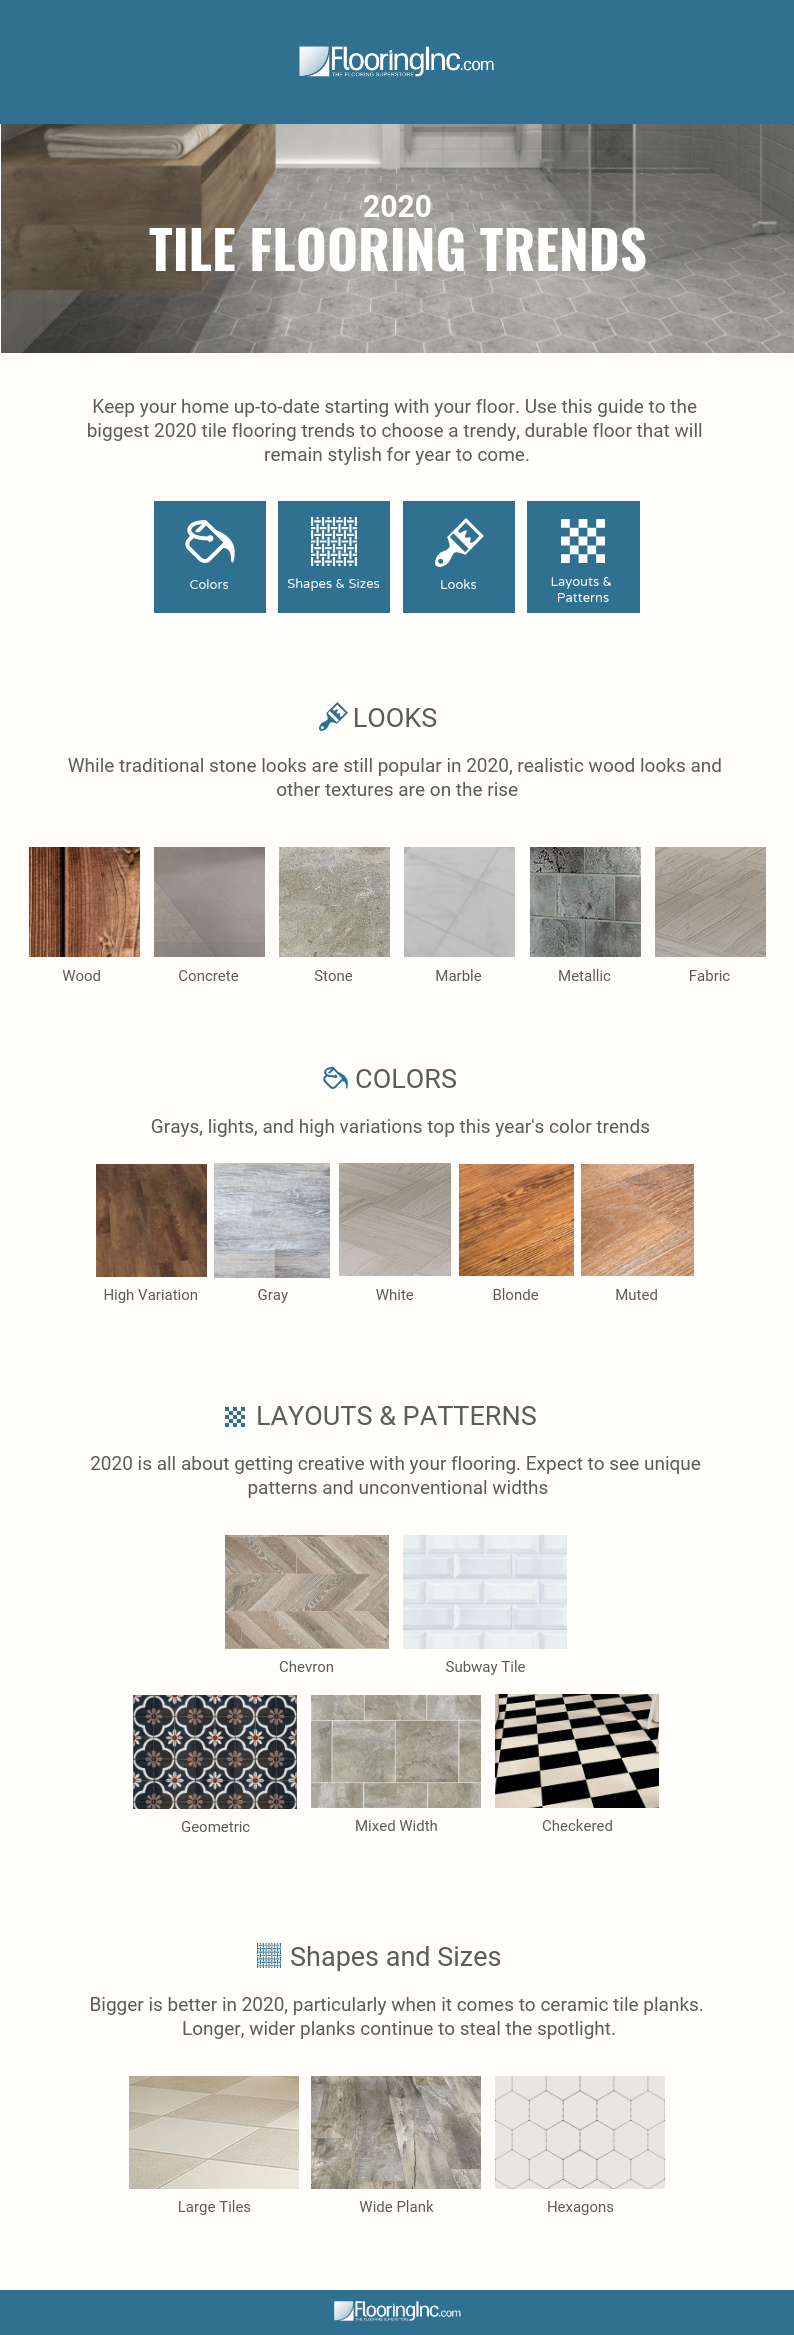 FlooringInc chart showing 2020 tile flooring trends